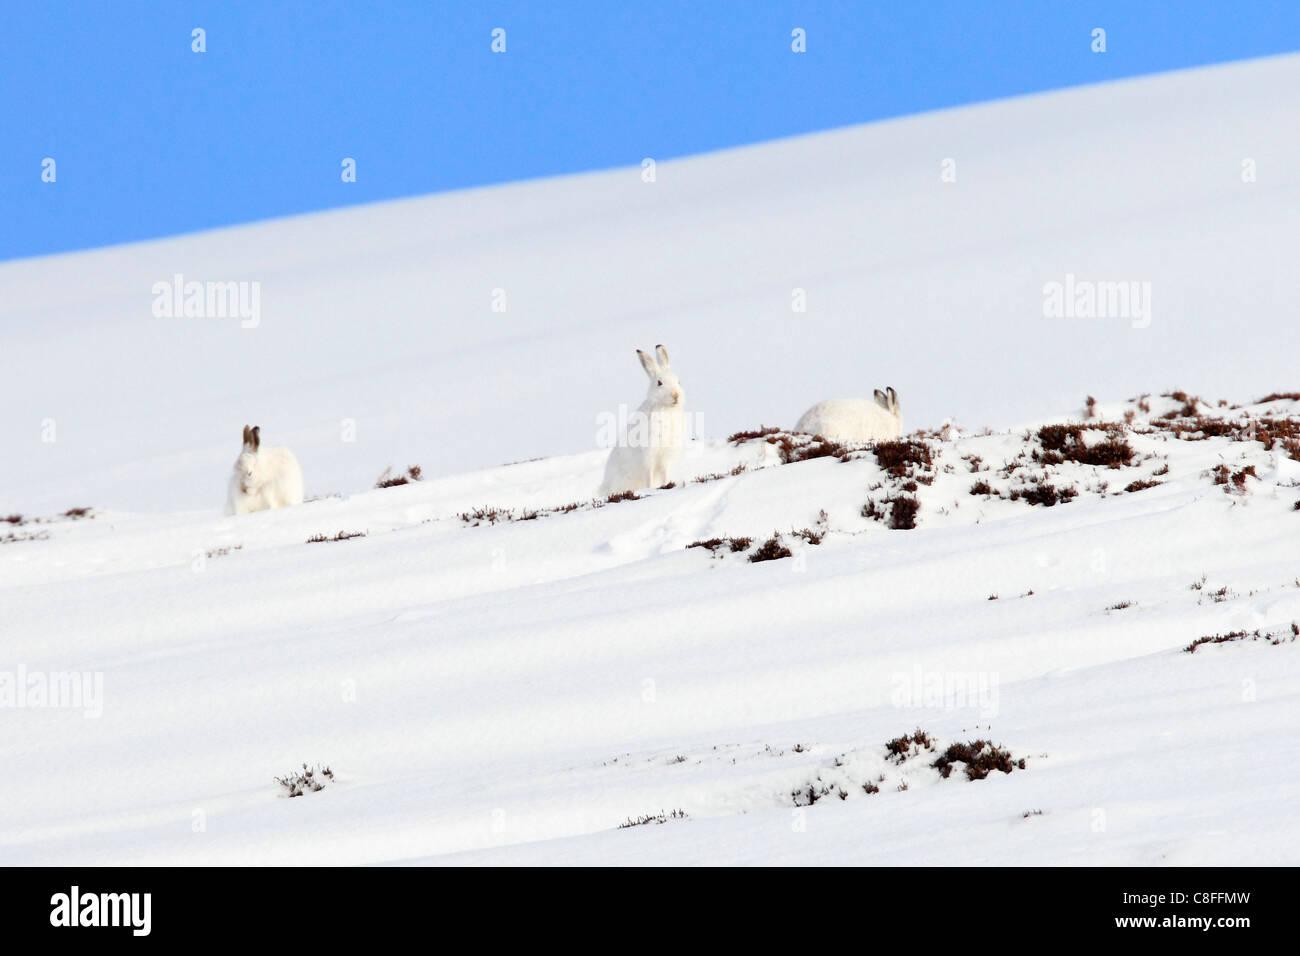 3, Alps, alpine, adapt, adjust, fauna, mountain, mountains, Cairngorms, ice, fauna, fur, cliff, mountains, hare, - Stock Image